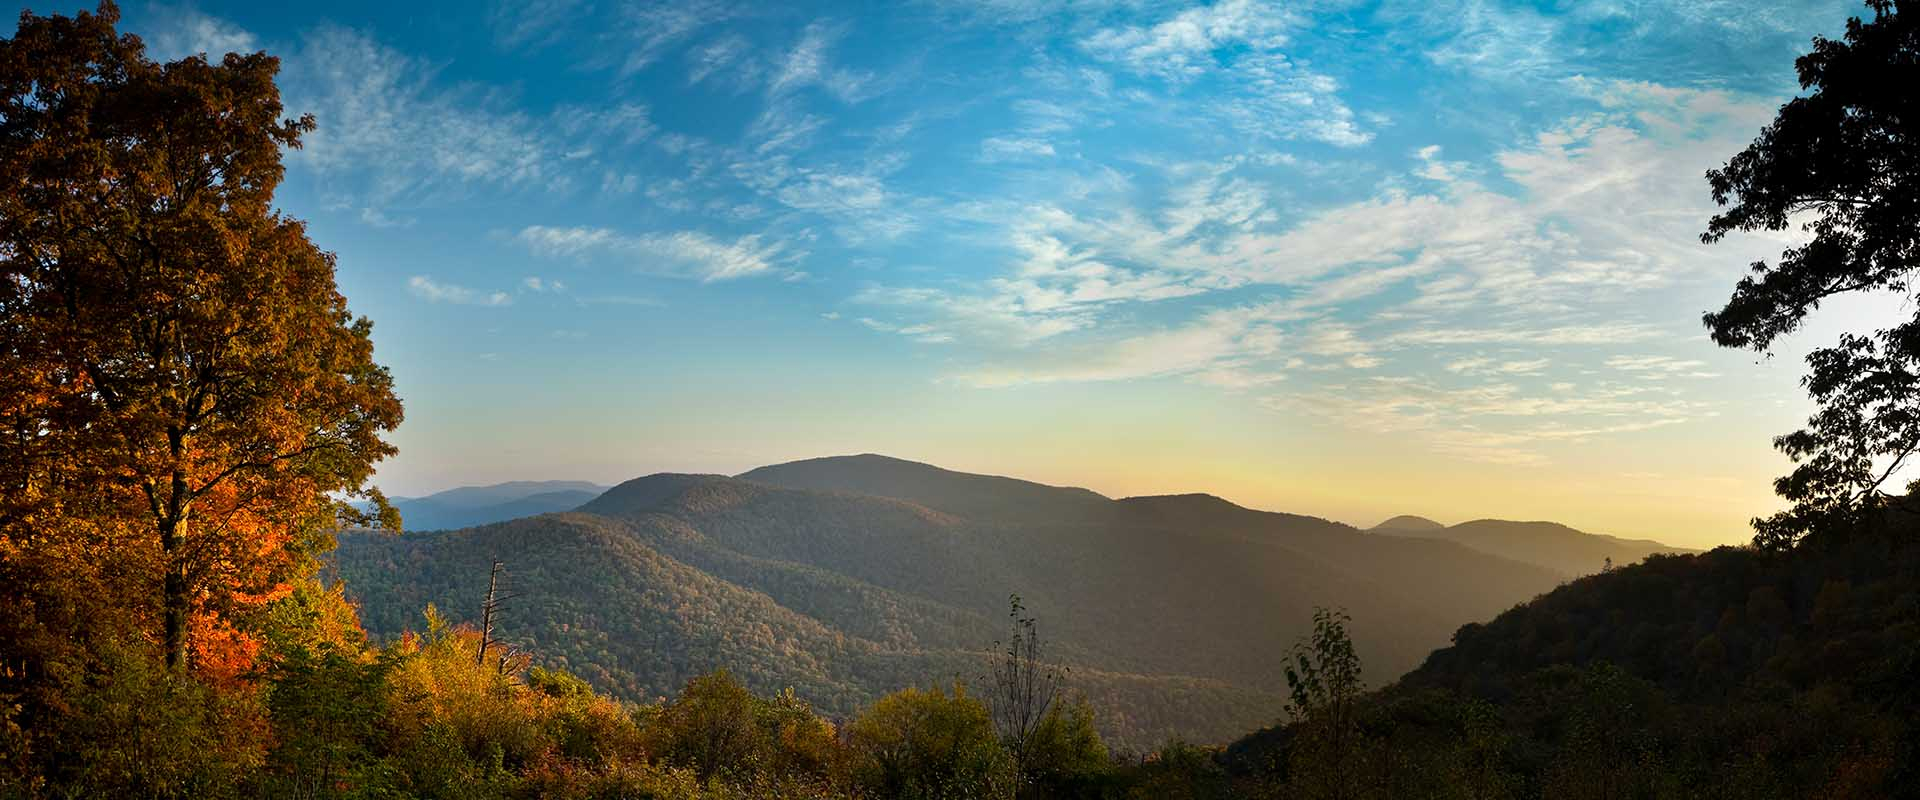 Virginia State Holidays - Publicholidays with Turning Stone October Calendar 2022